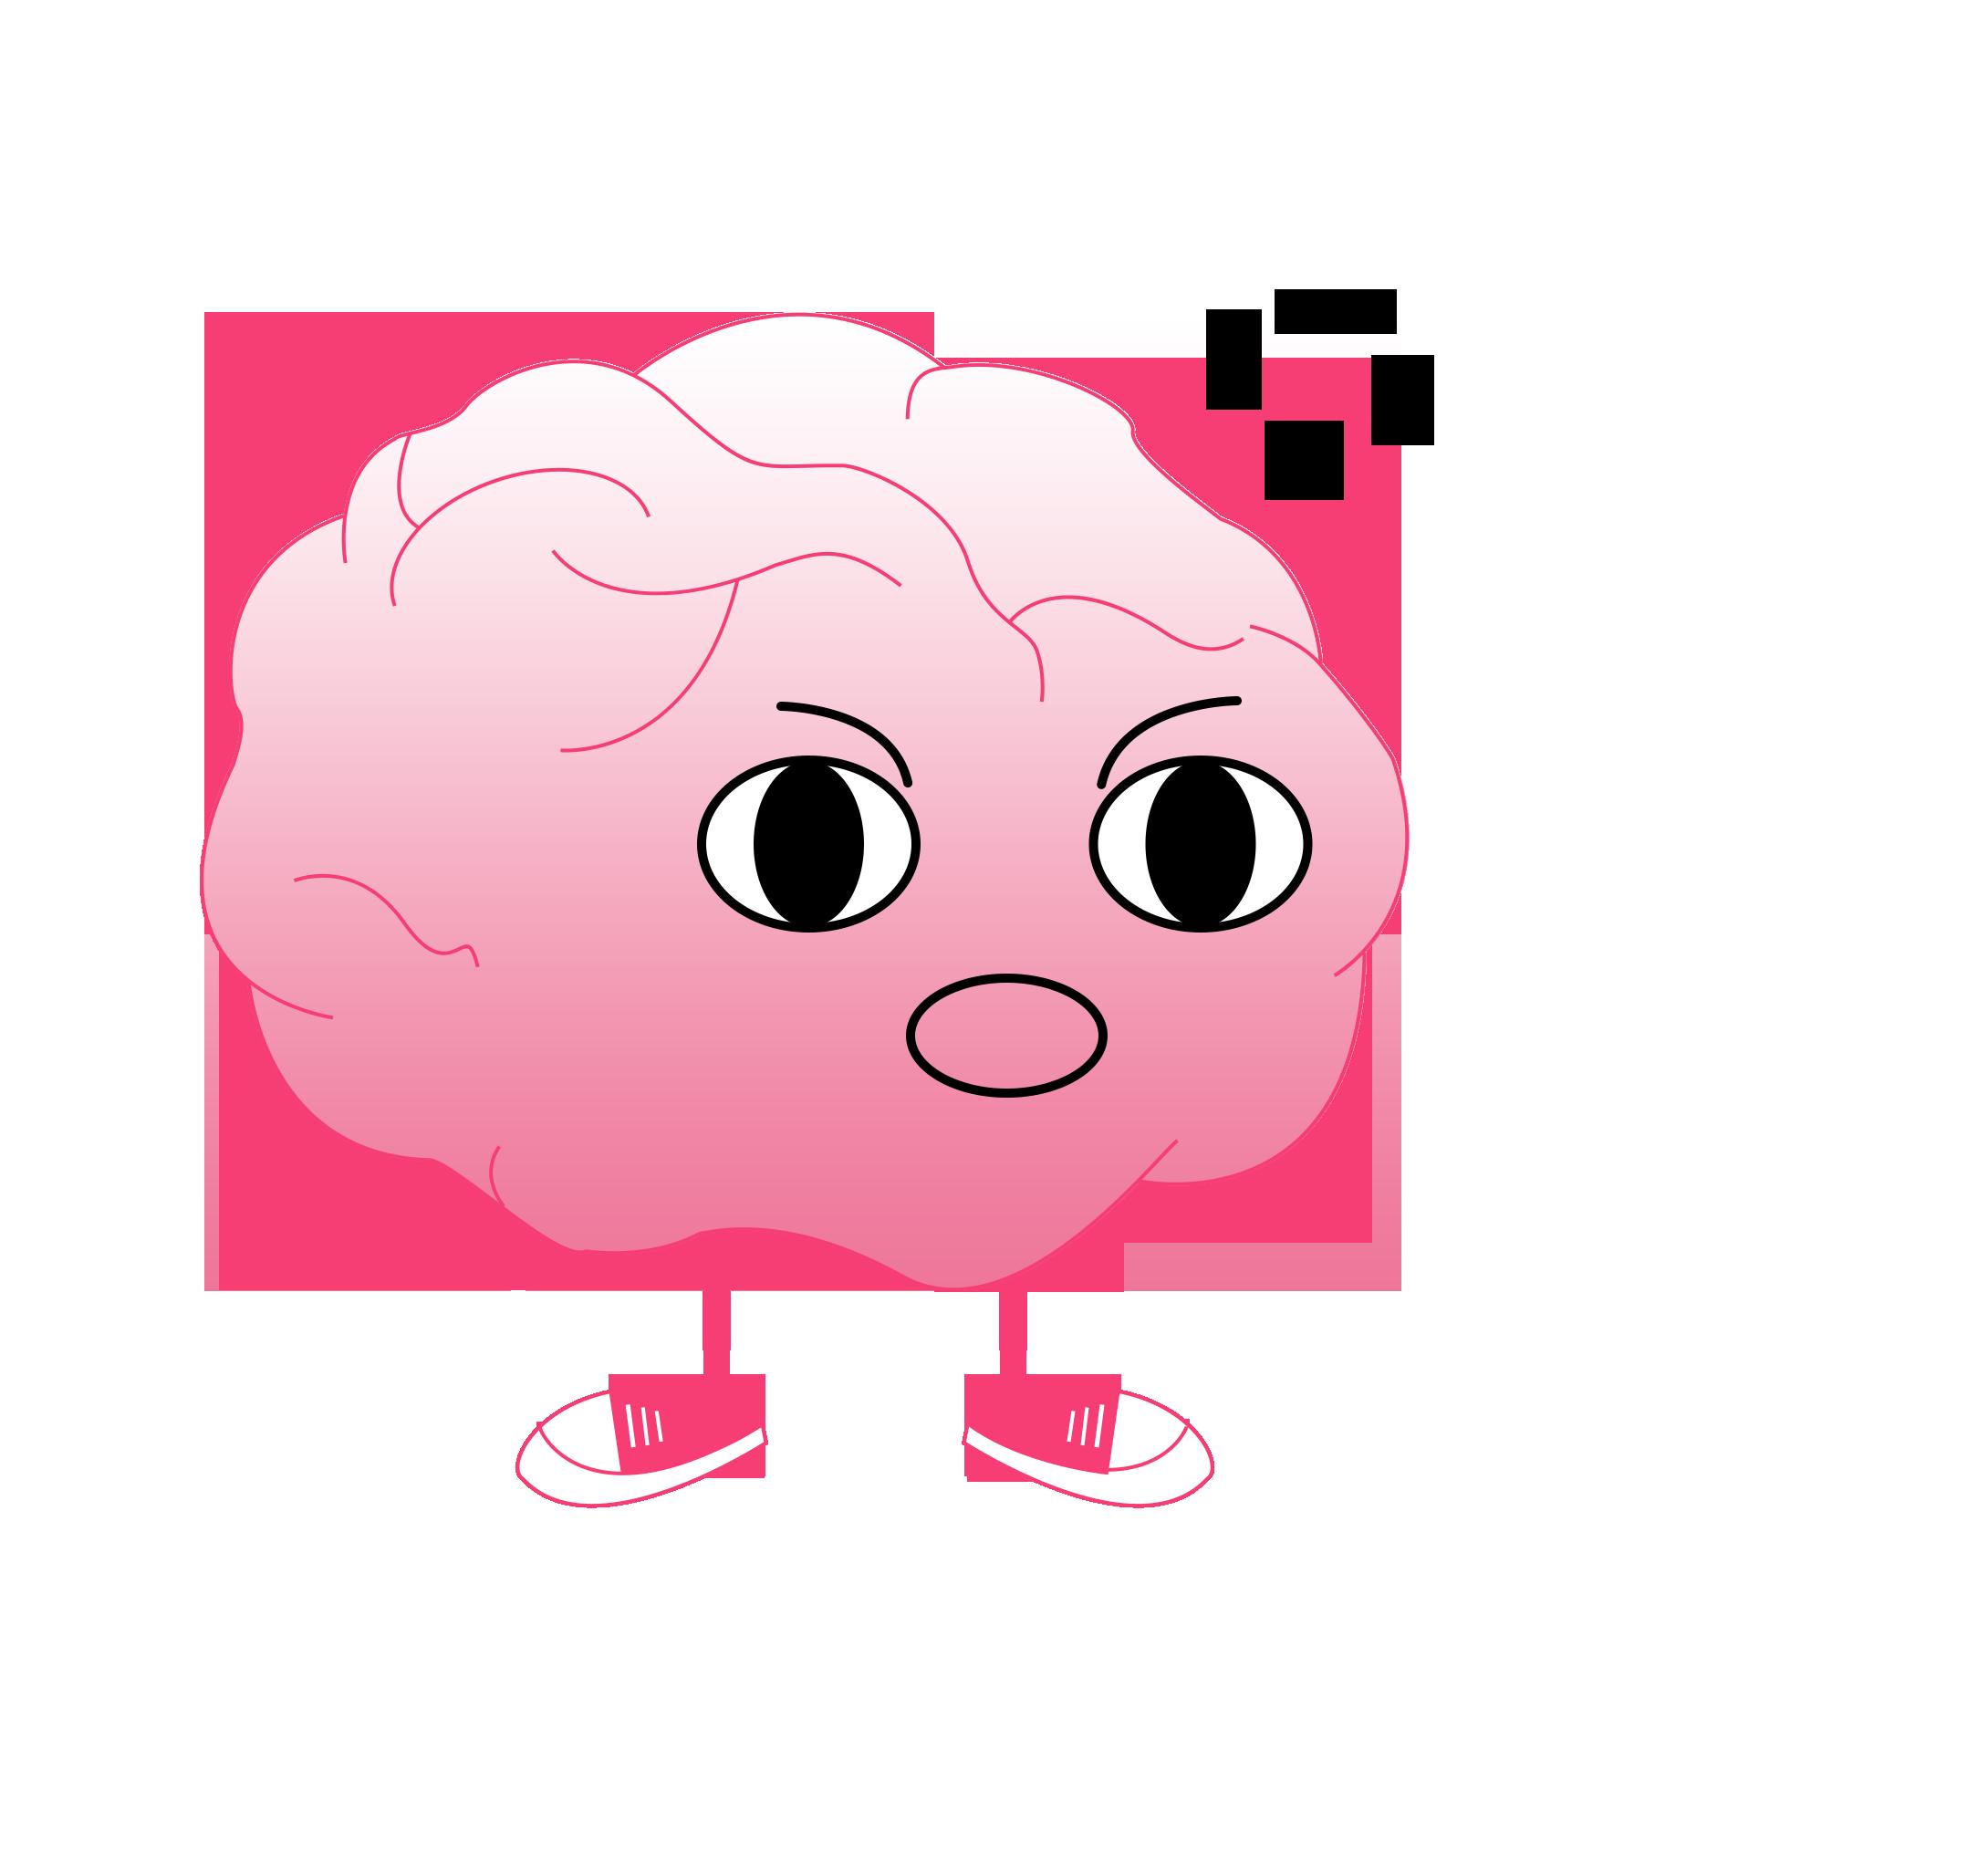 脑洞大师-Emoji样式贼多 messages sticker-8